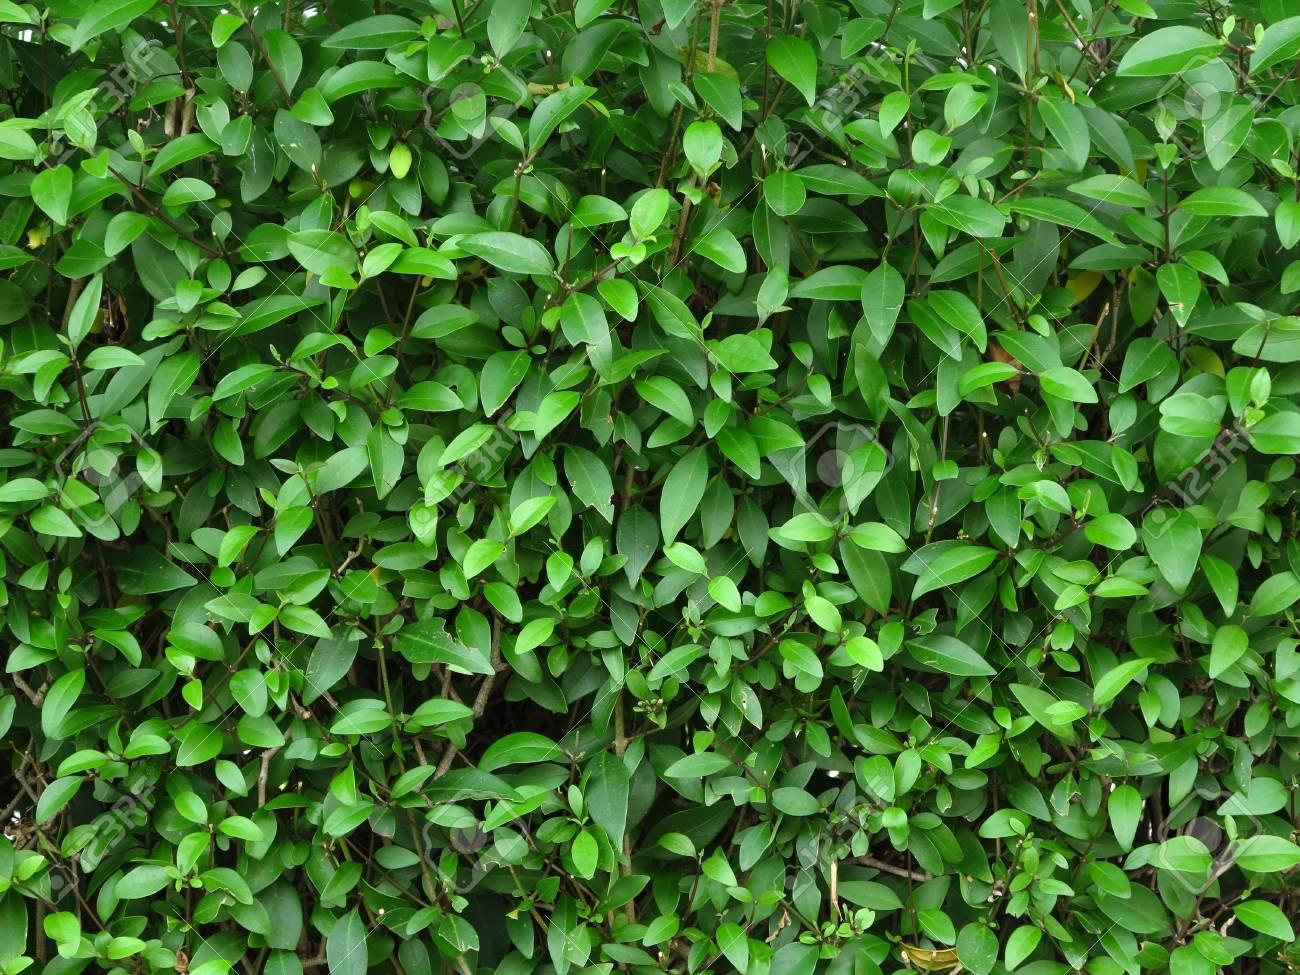 green leaf of bush wall in garden